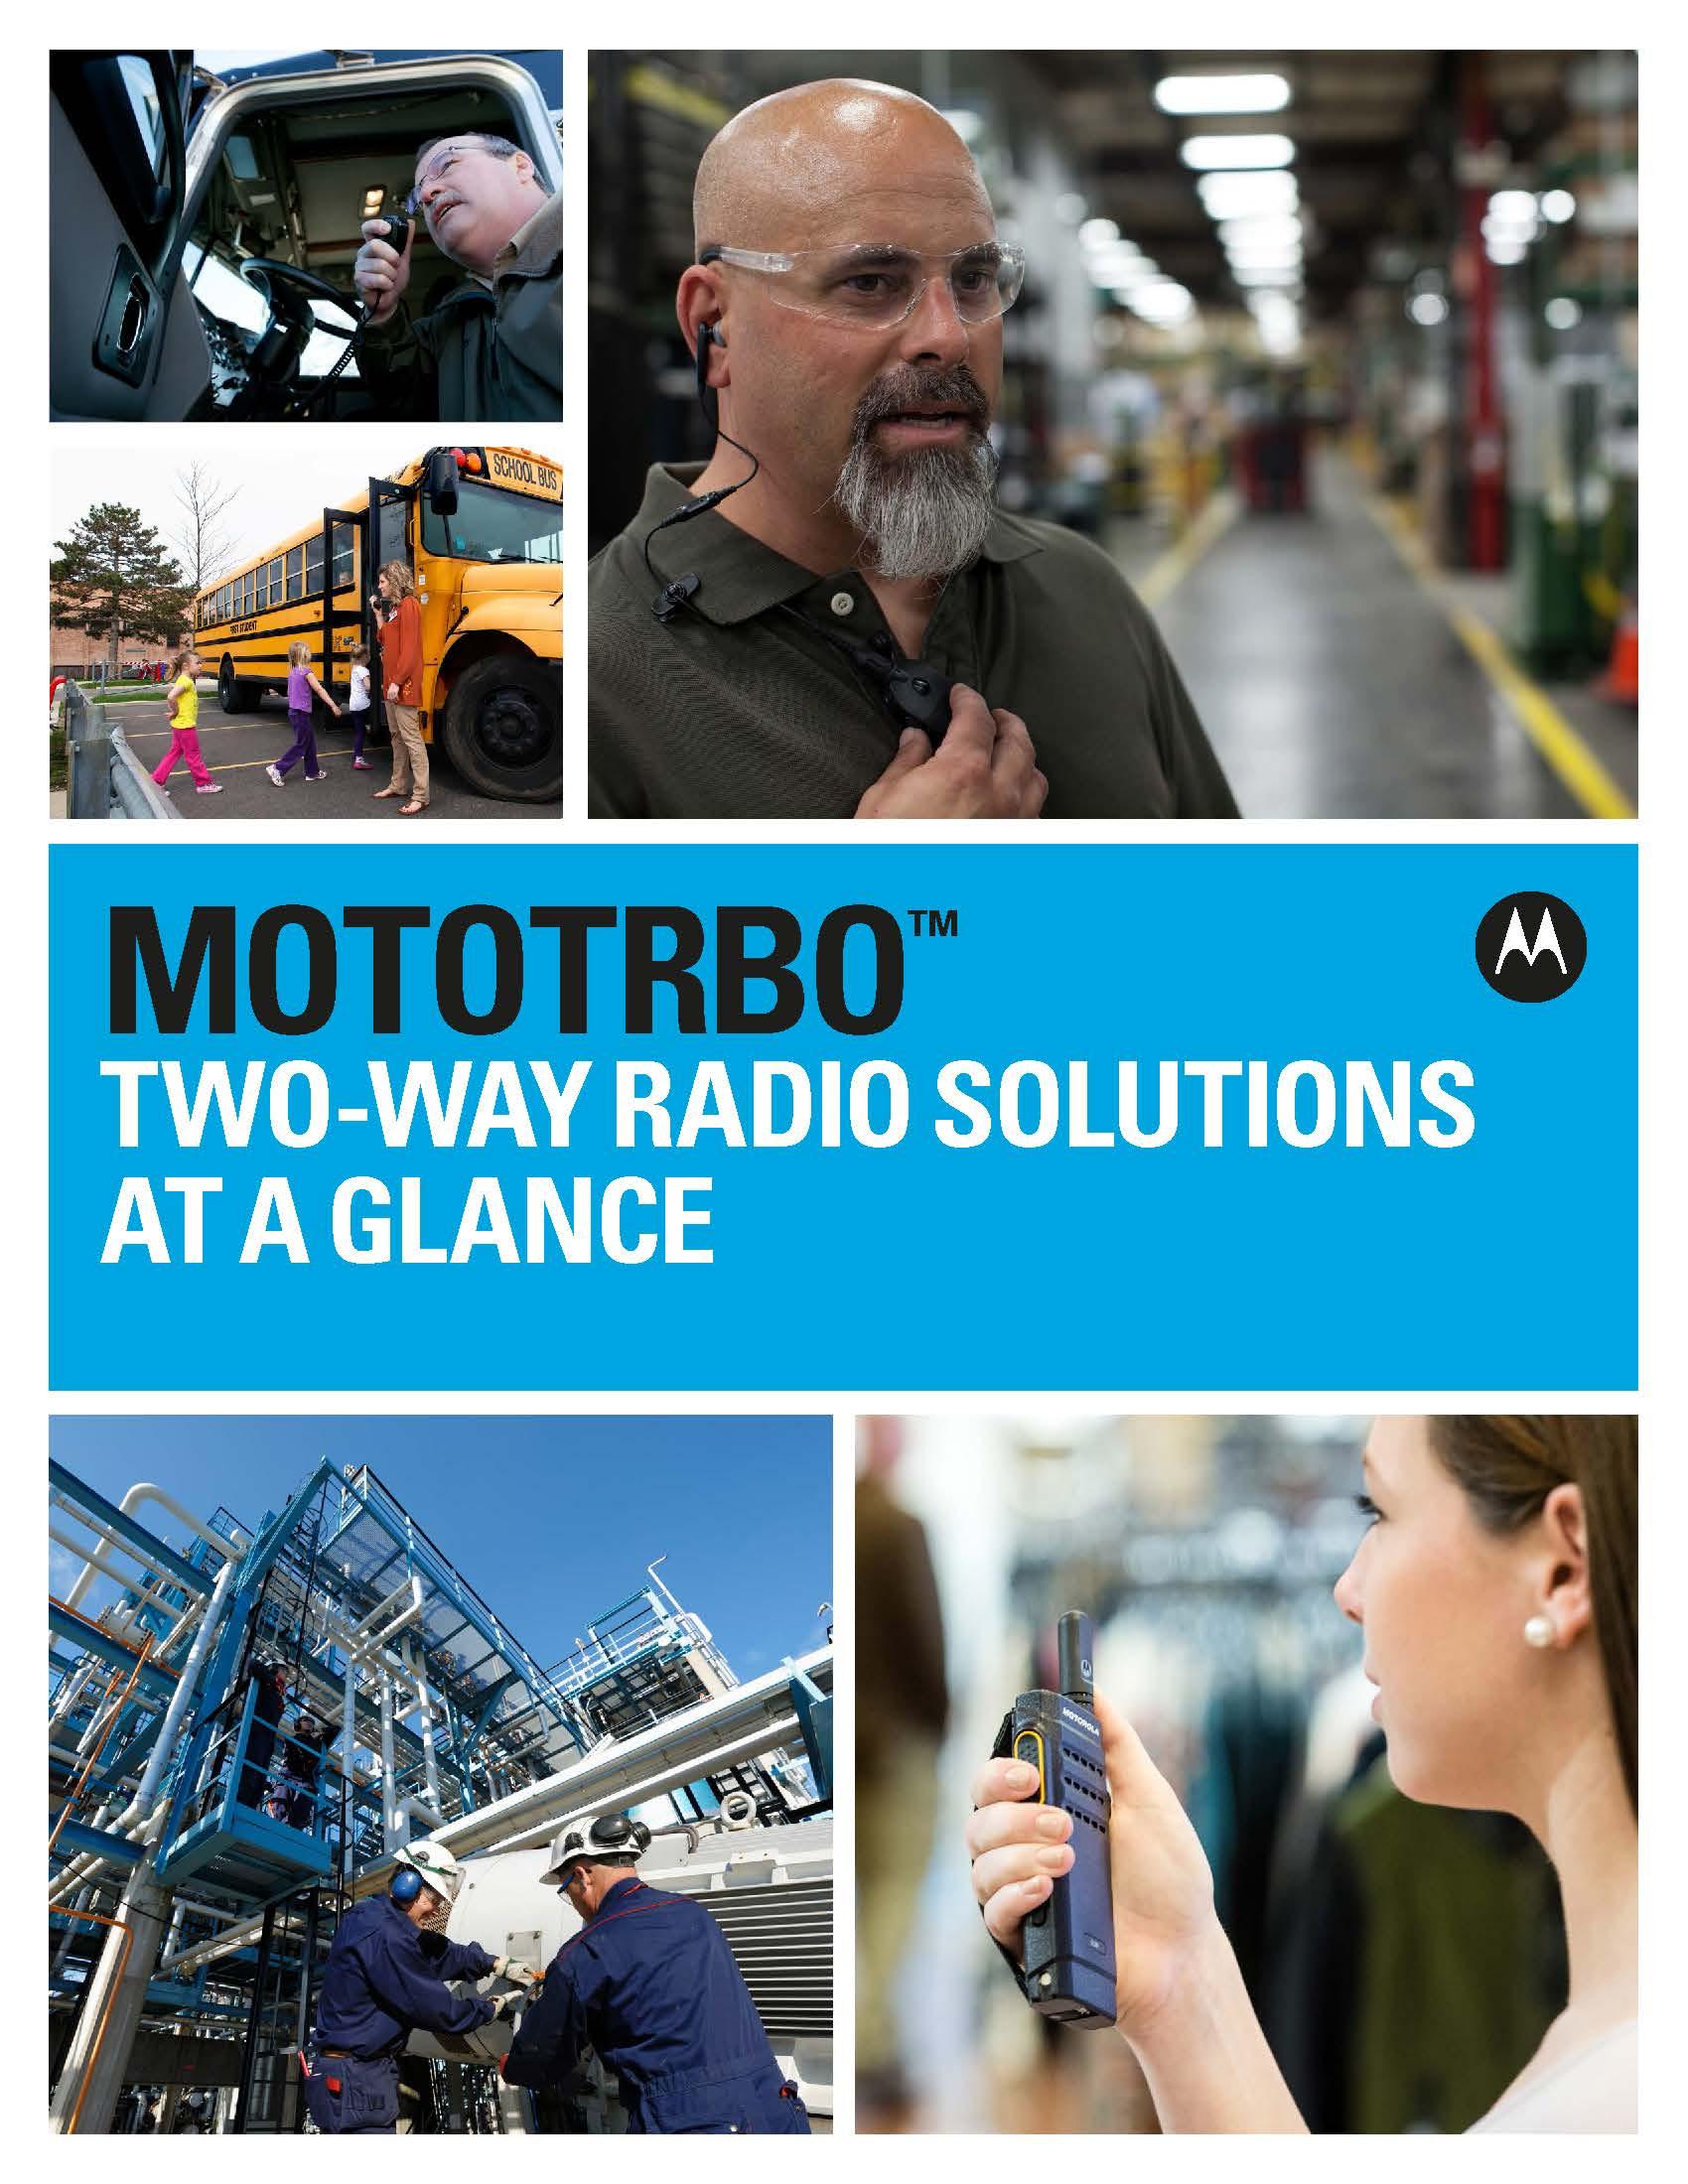 mototrbo_ataglance_brochure_Pagina_01